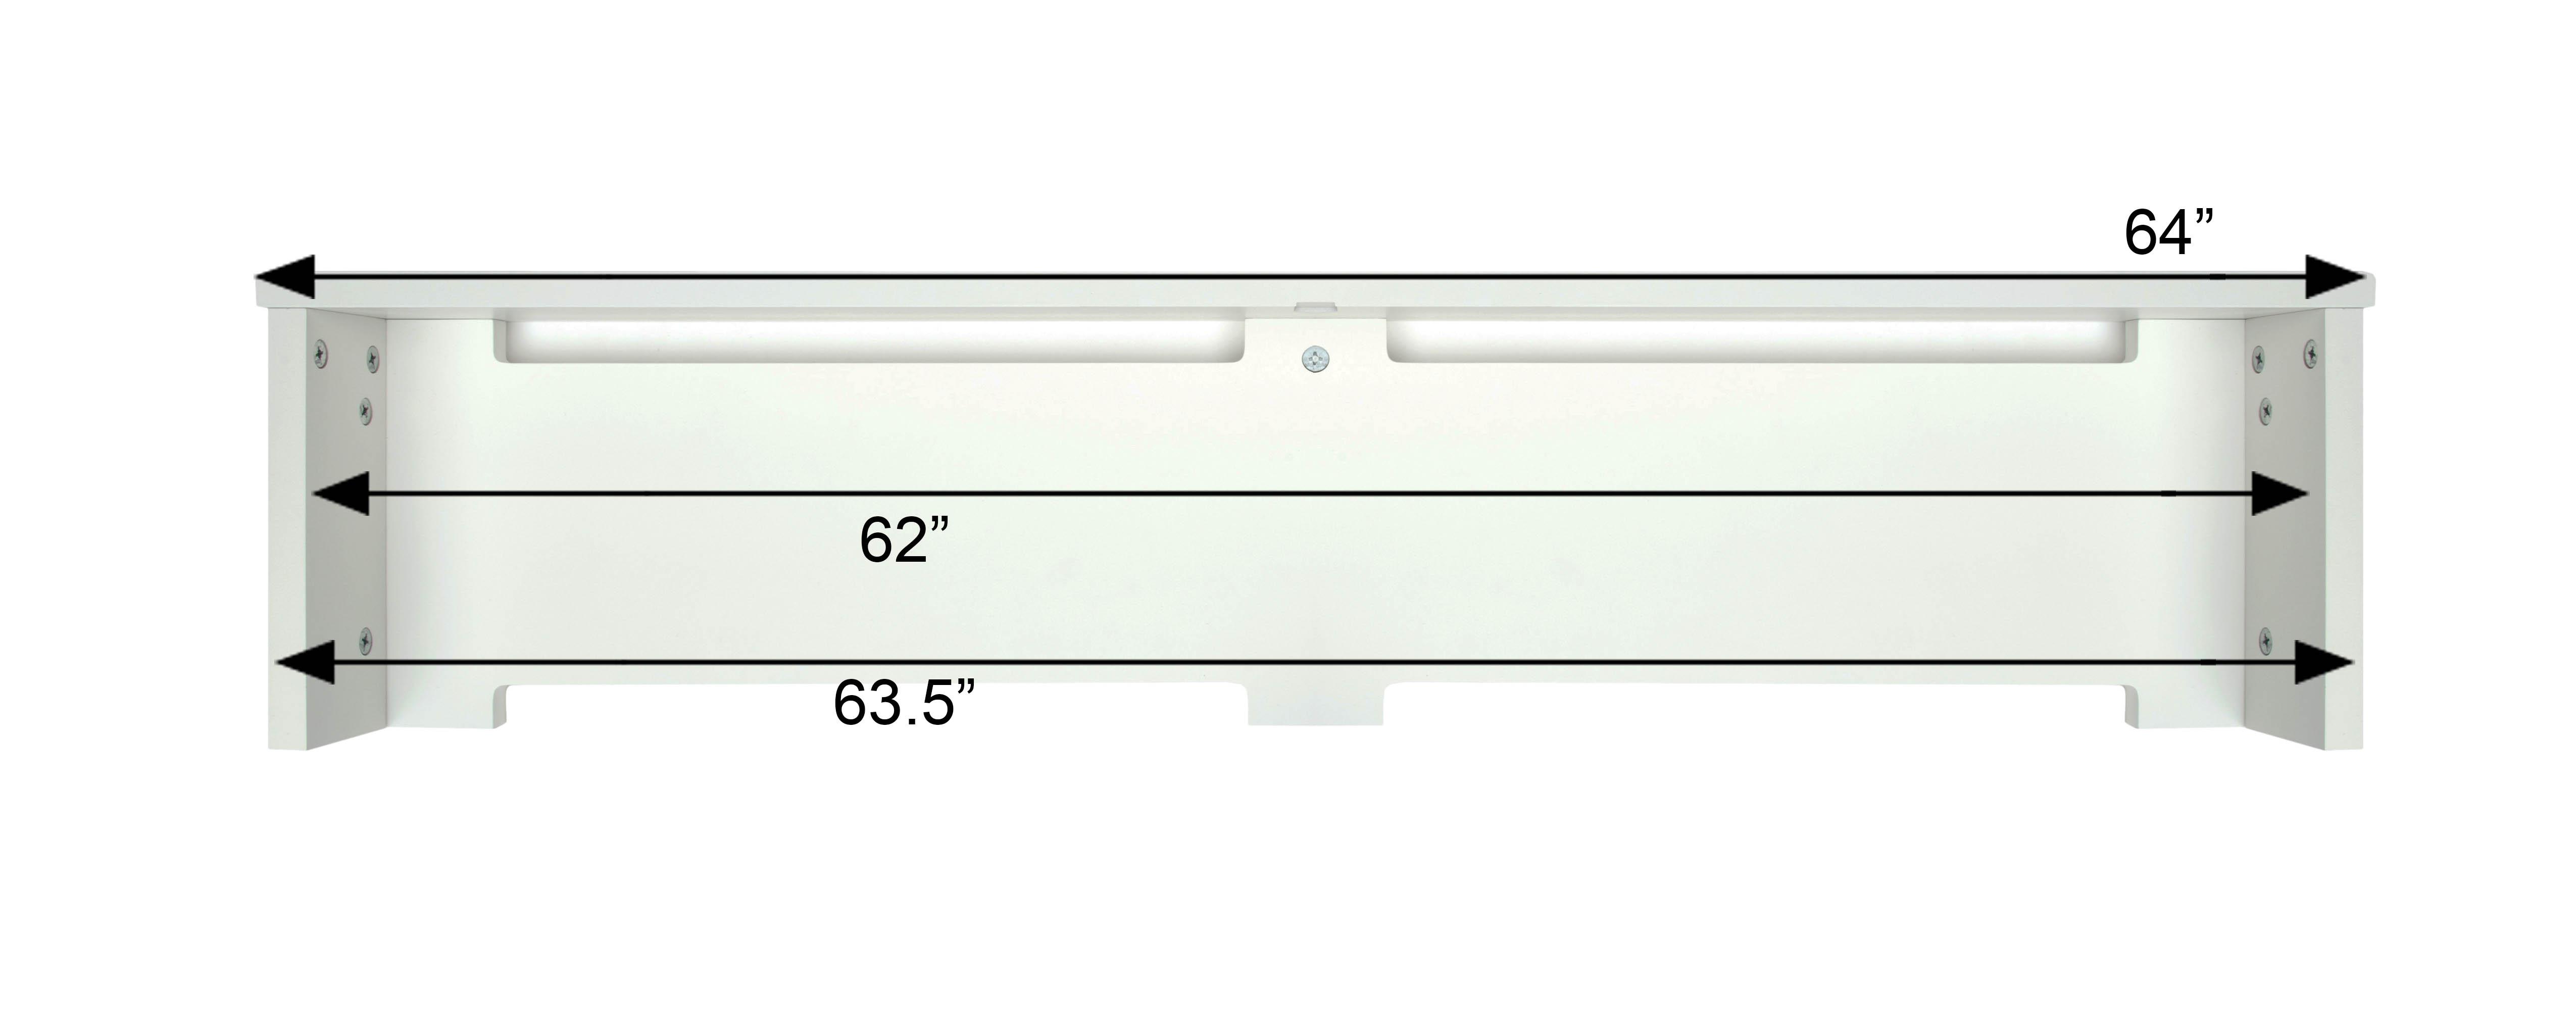 wood-baseboard-cover-back-5-measurements.jpg